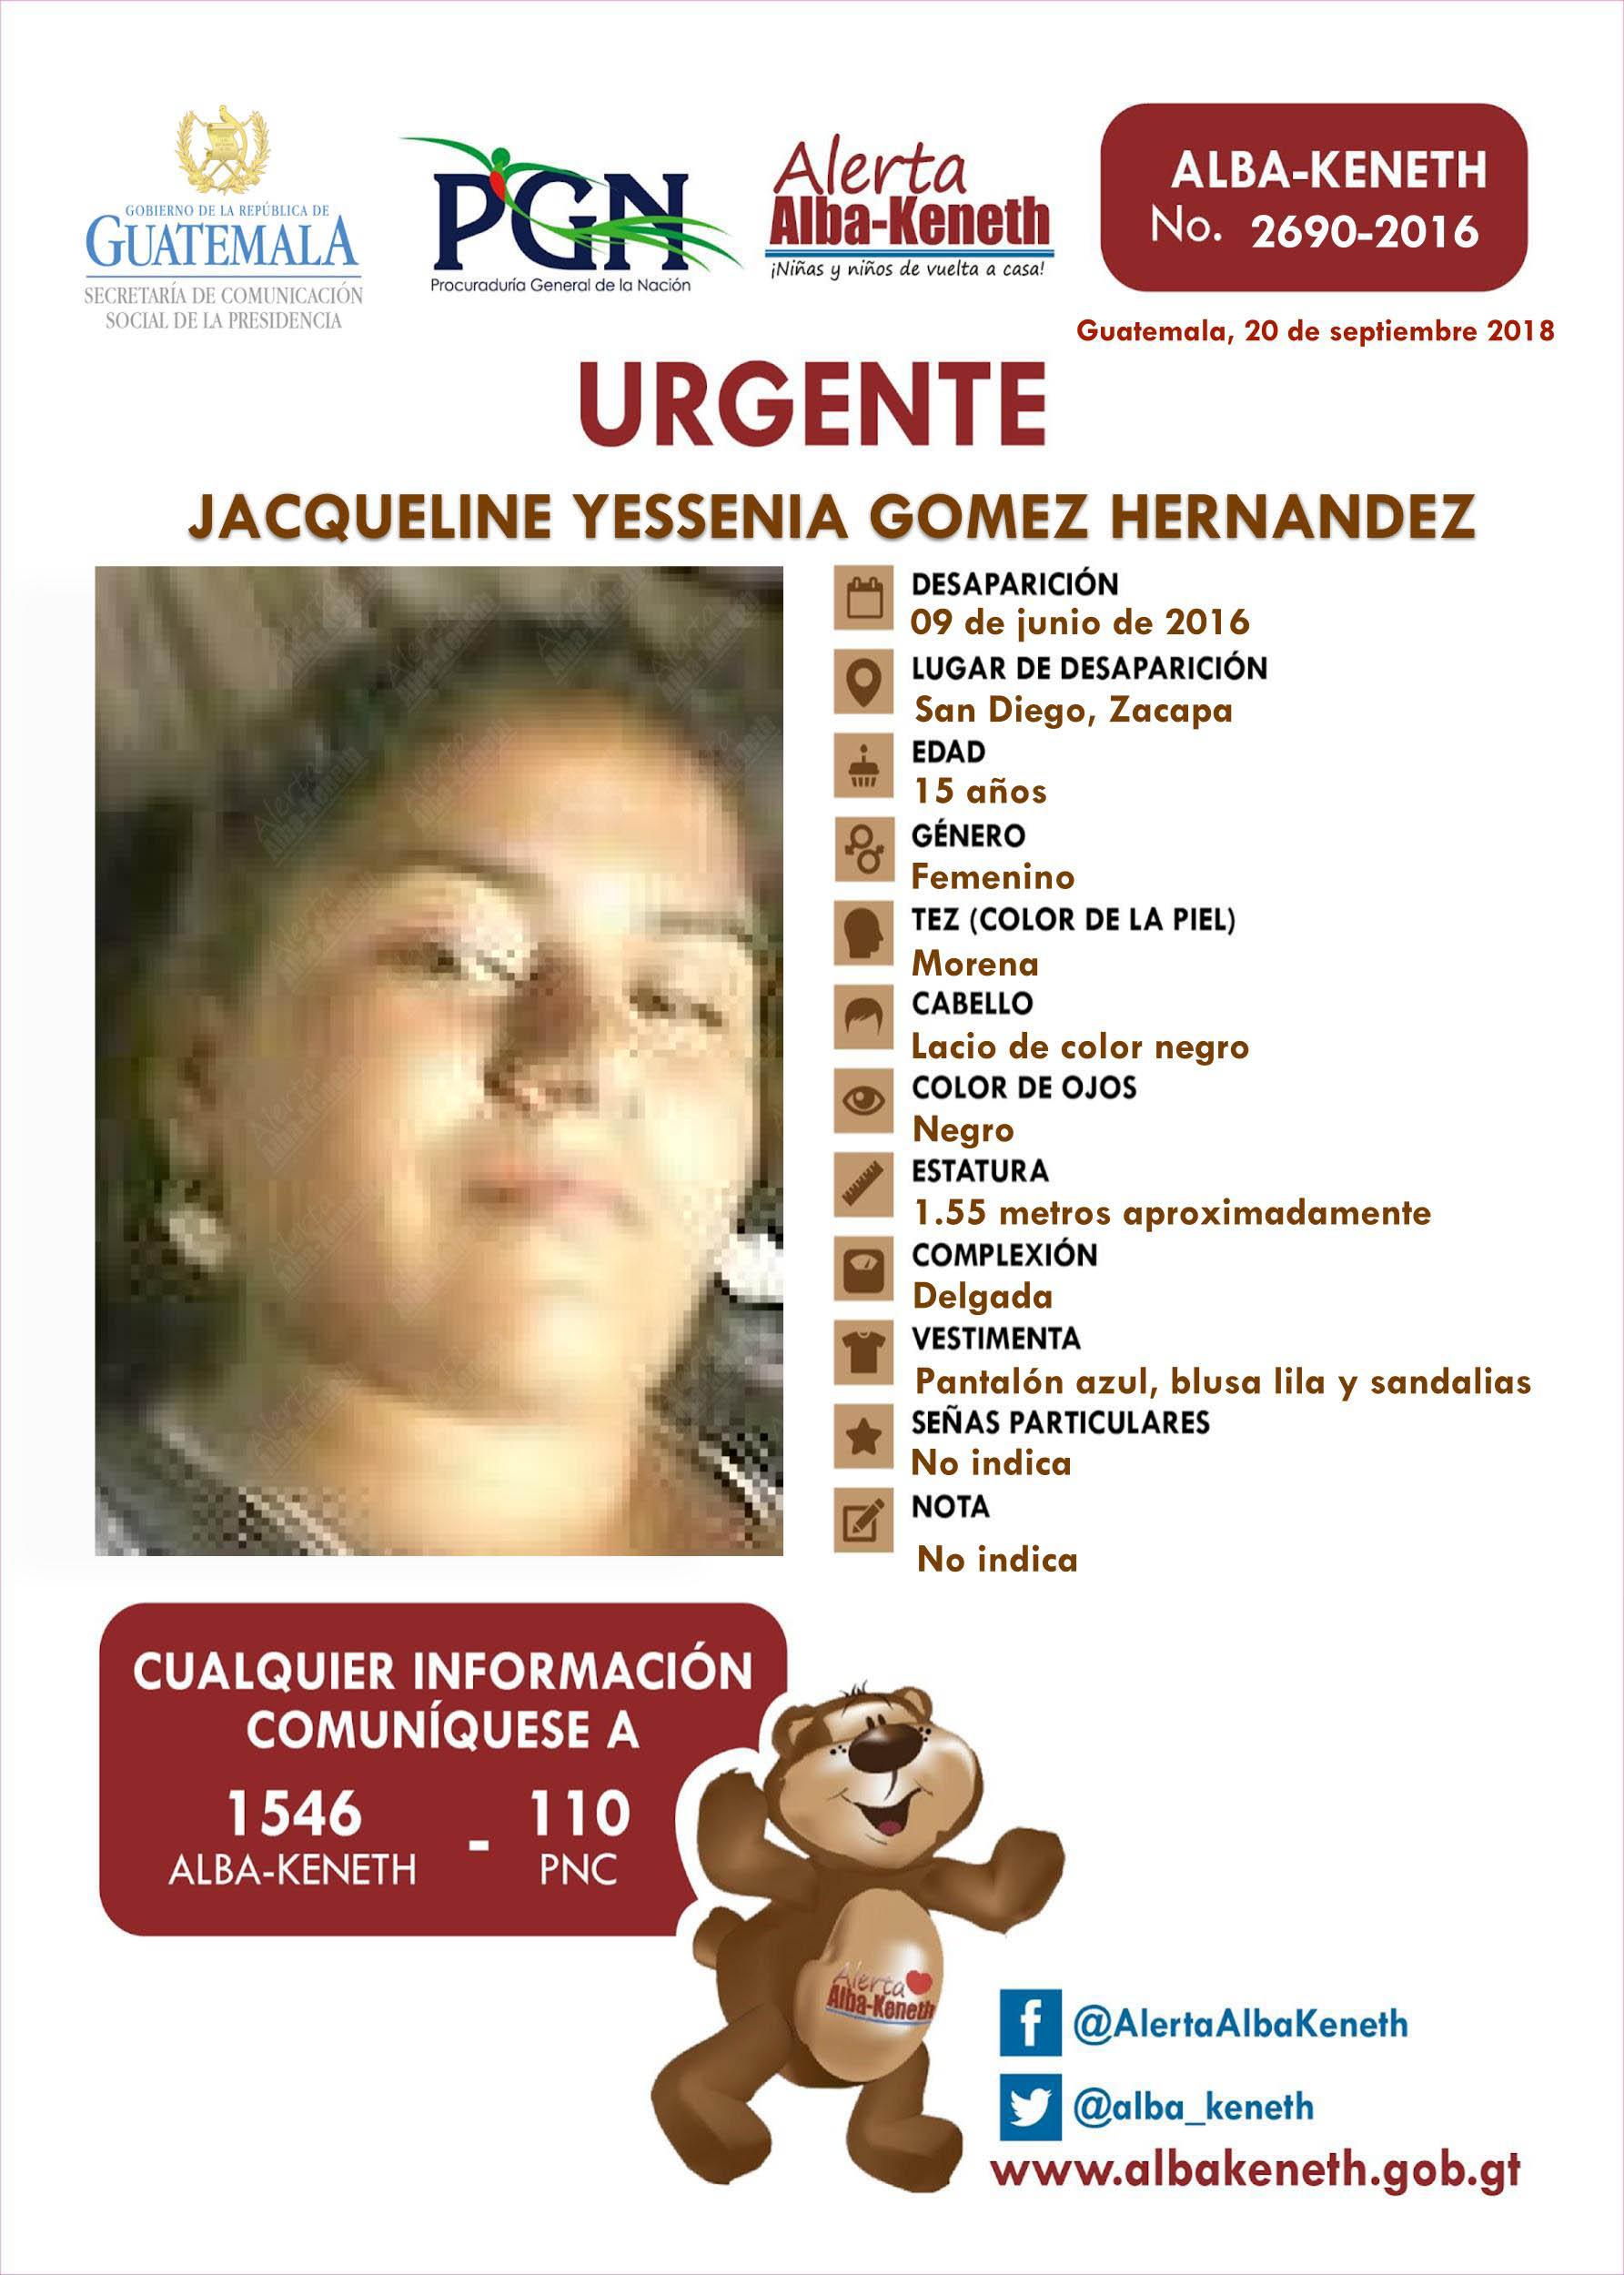 Jacqueline Yessenia Gomez Hernandez